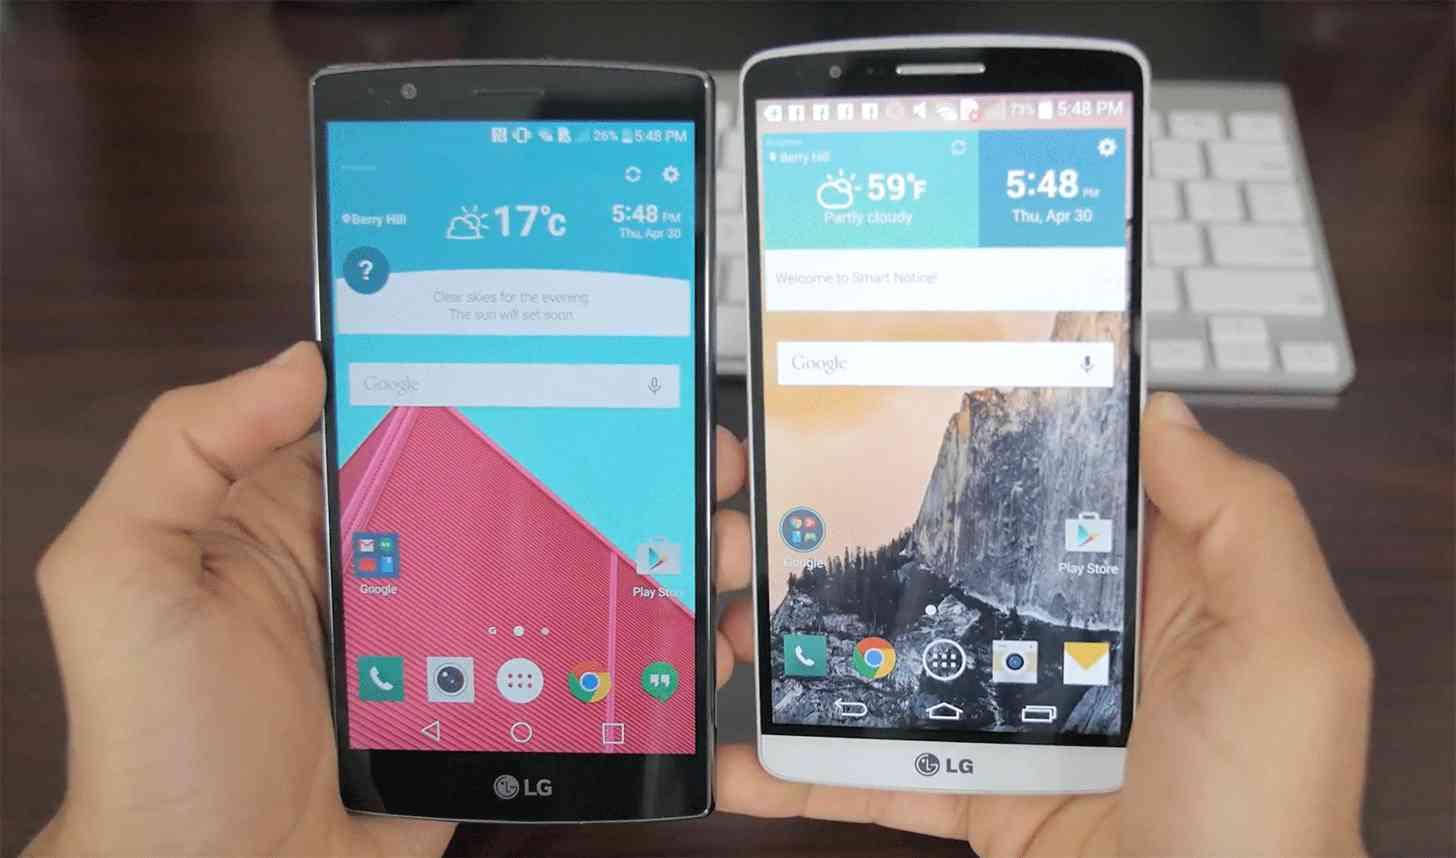 LG G4, LG G3 comparison